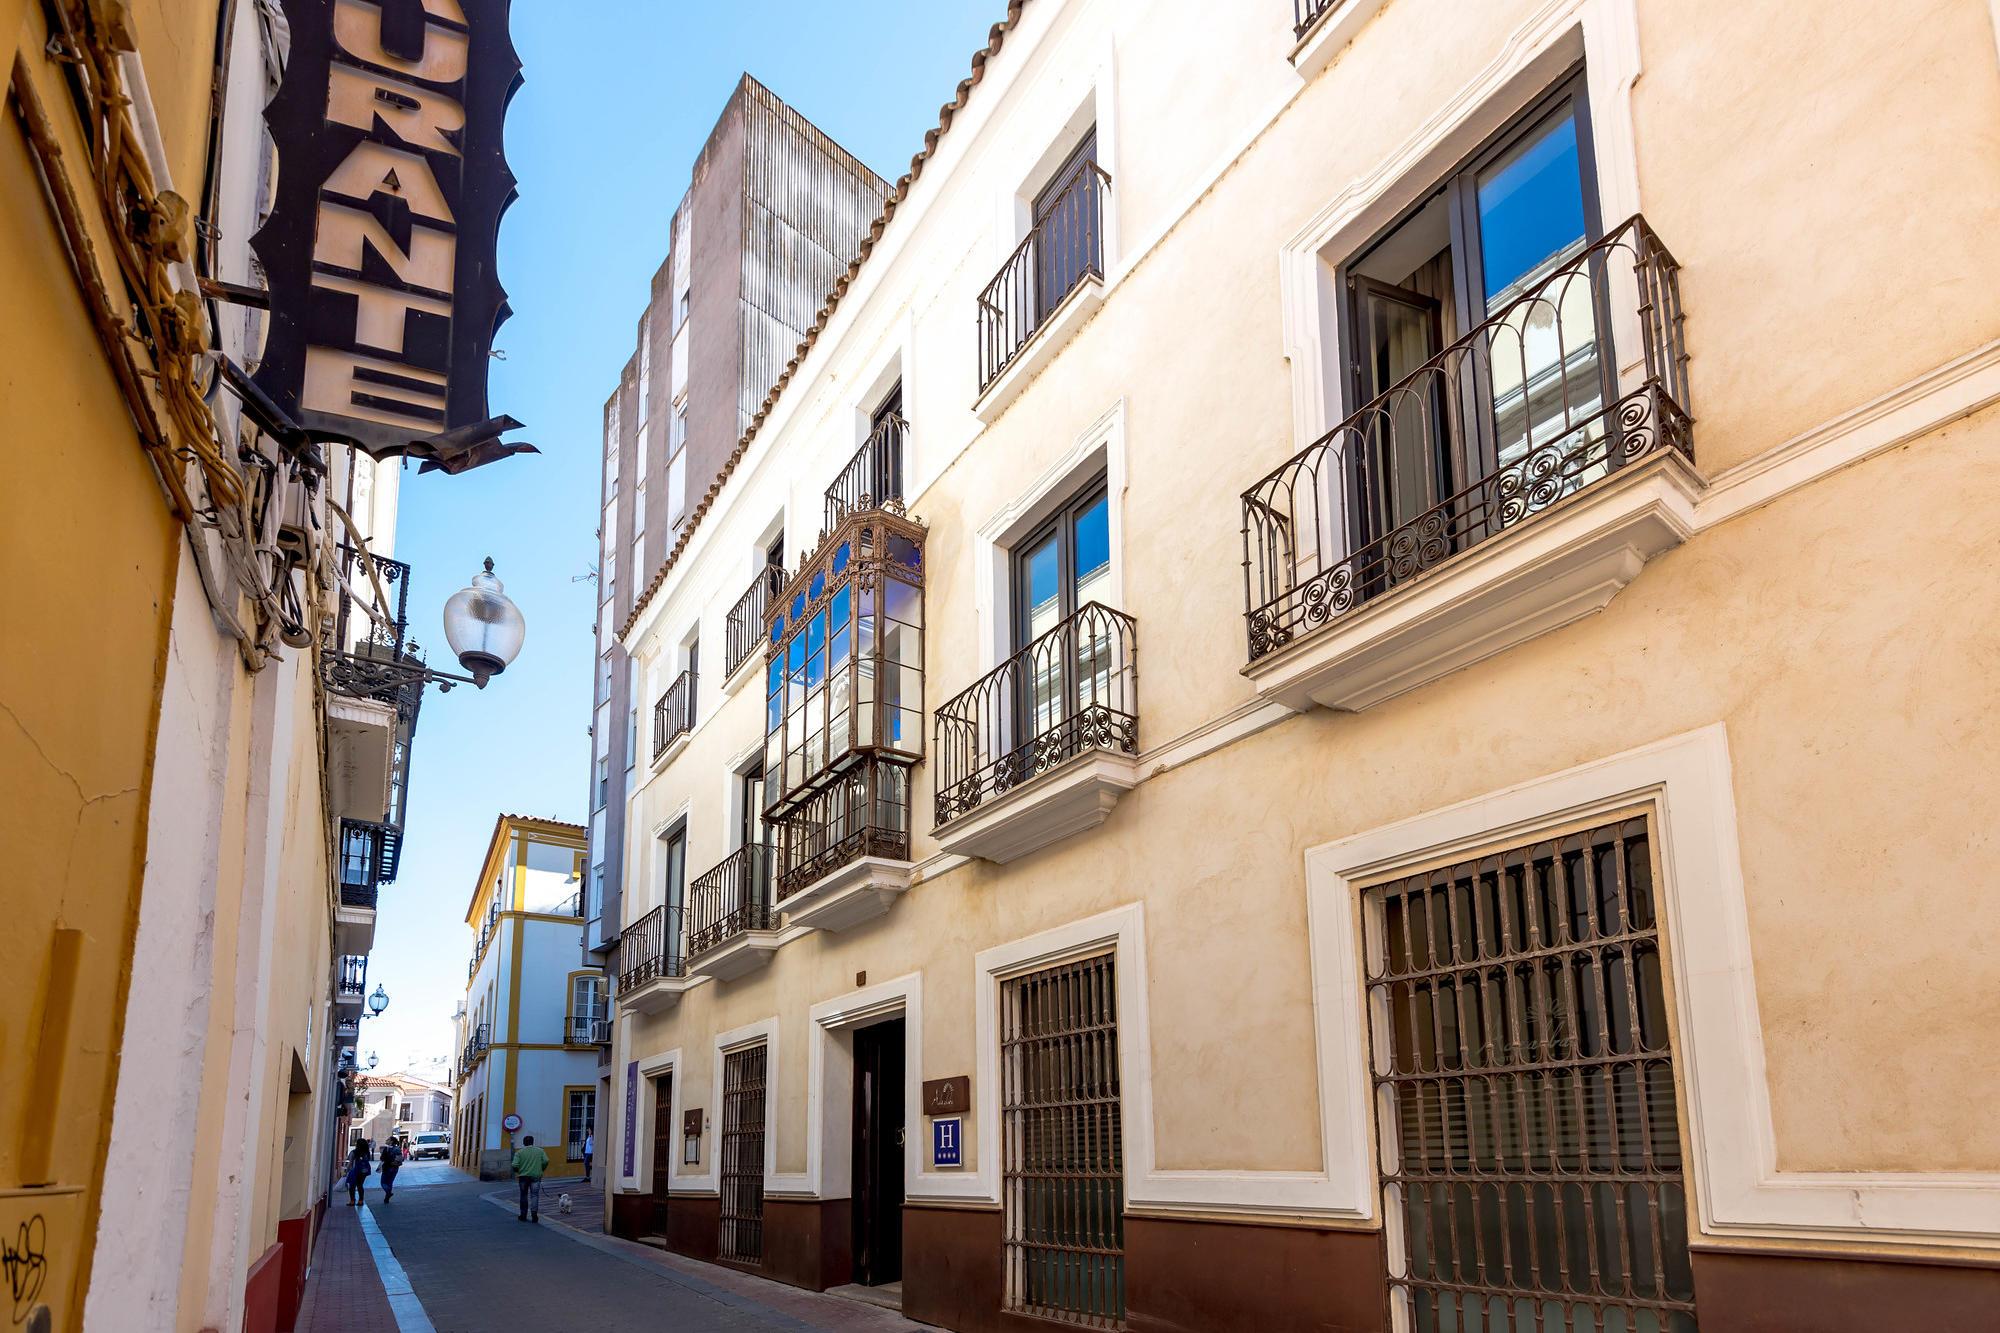 The narrow lanes of colonial Merida